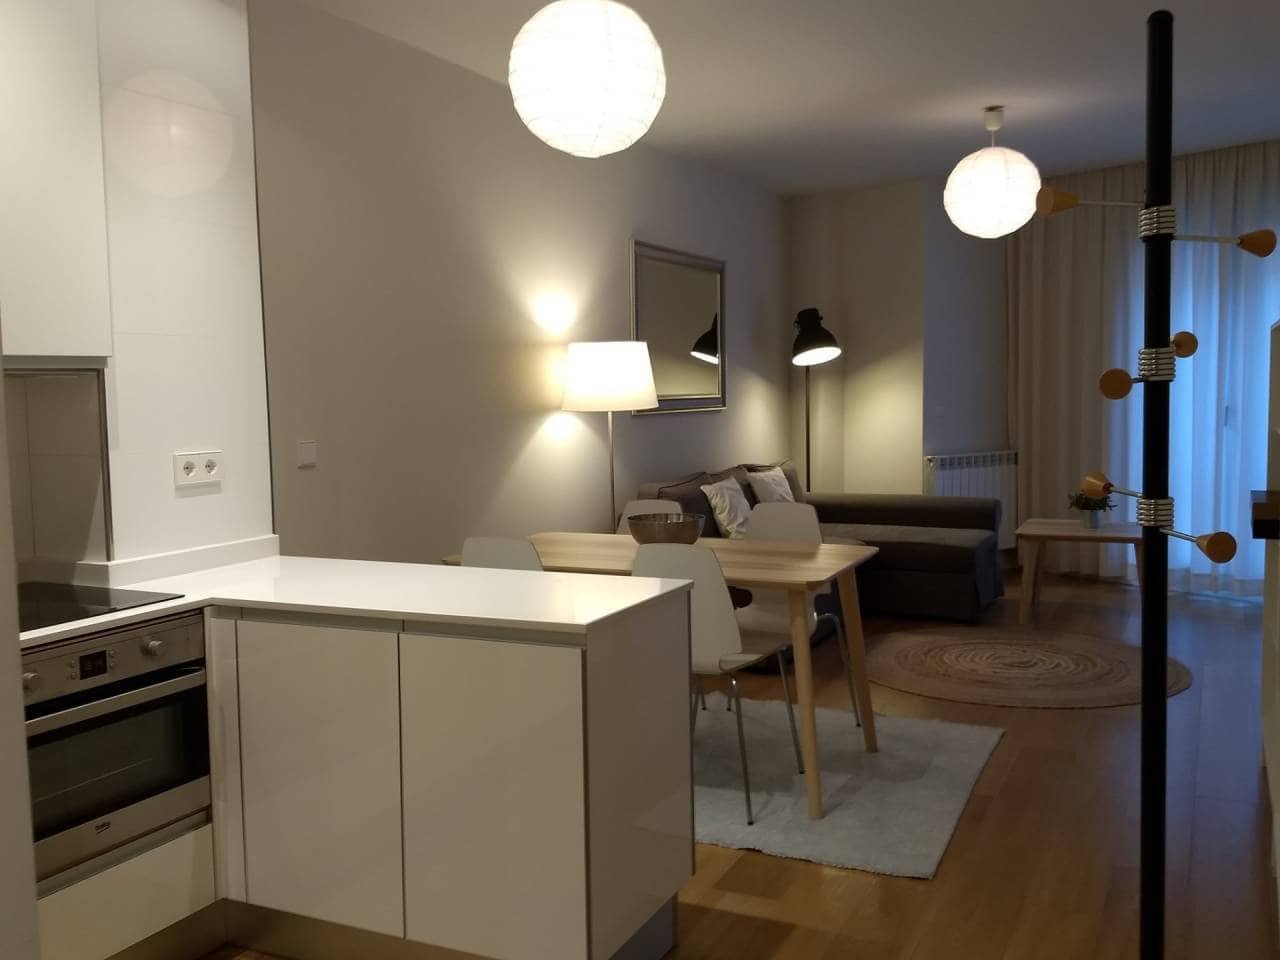 Appartement de 1 chambre à louer à Bilbao - 1 100 € (Ref: 4374629)